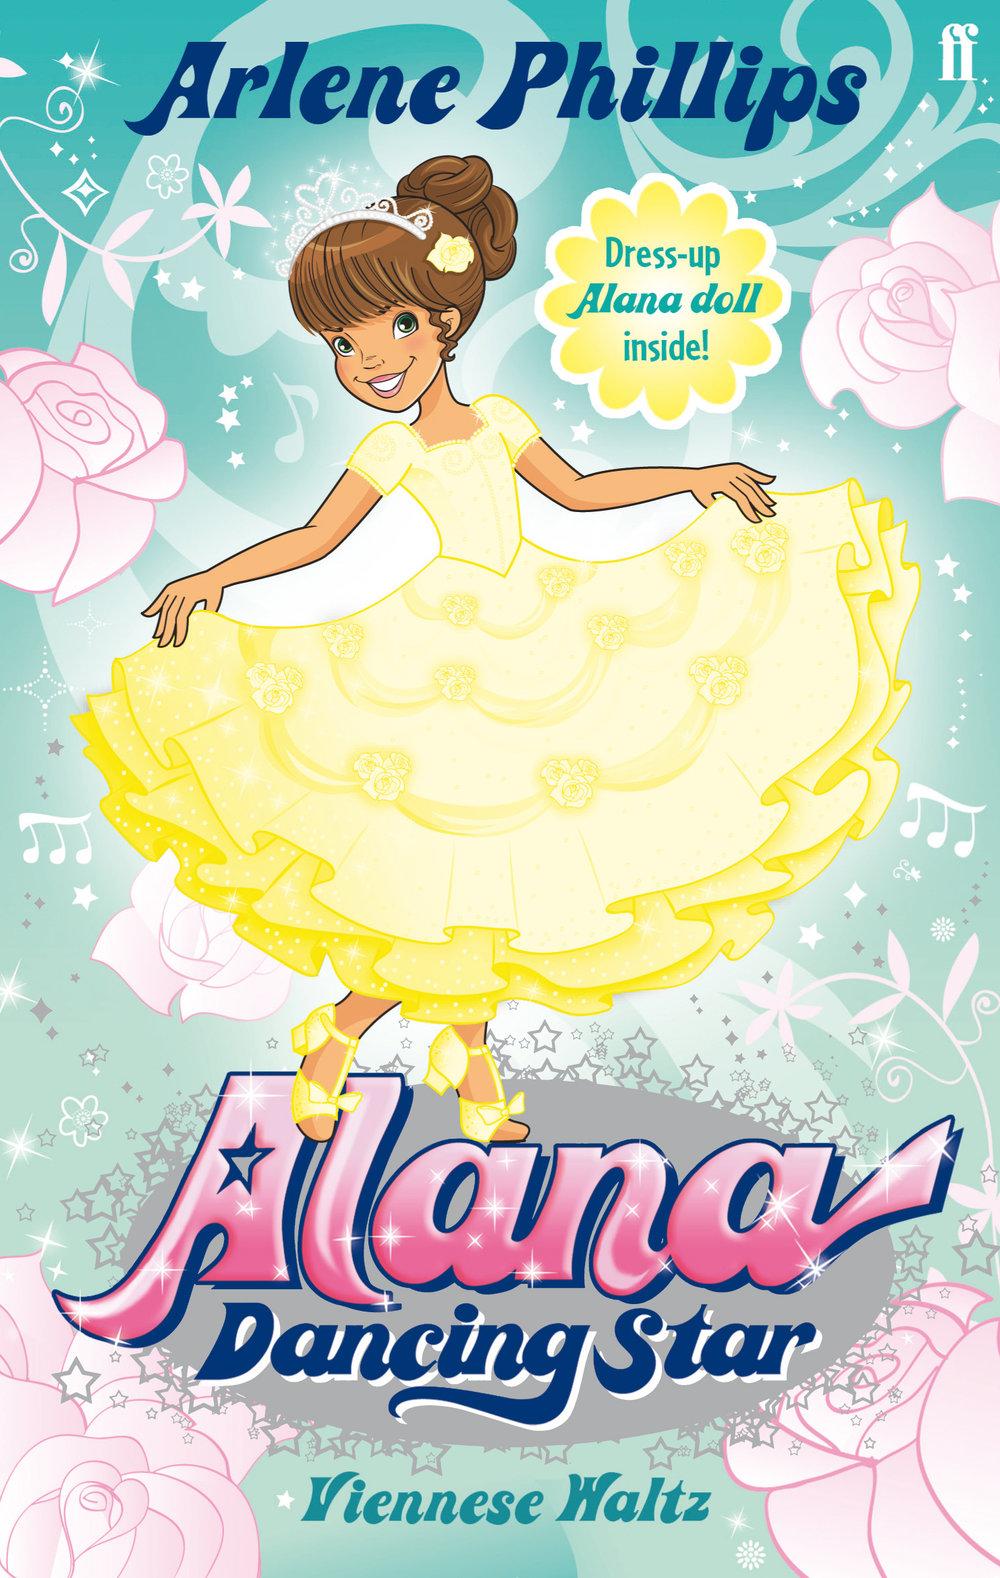 Alana Dancing Star - Viennese Waltz.jpg